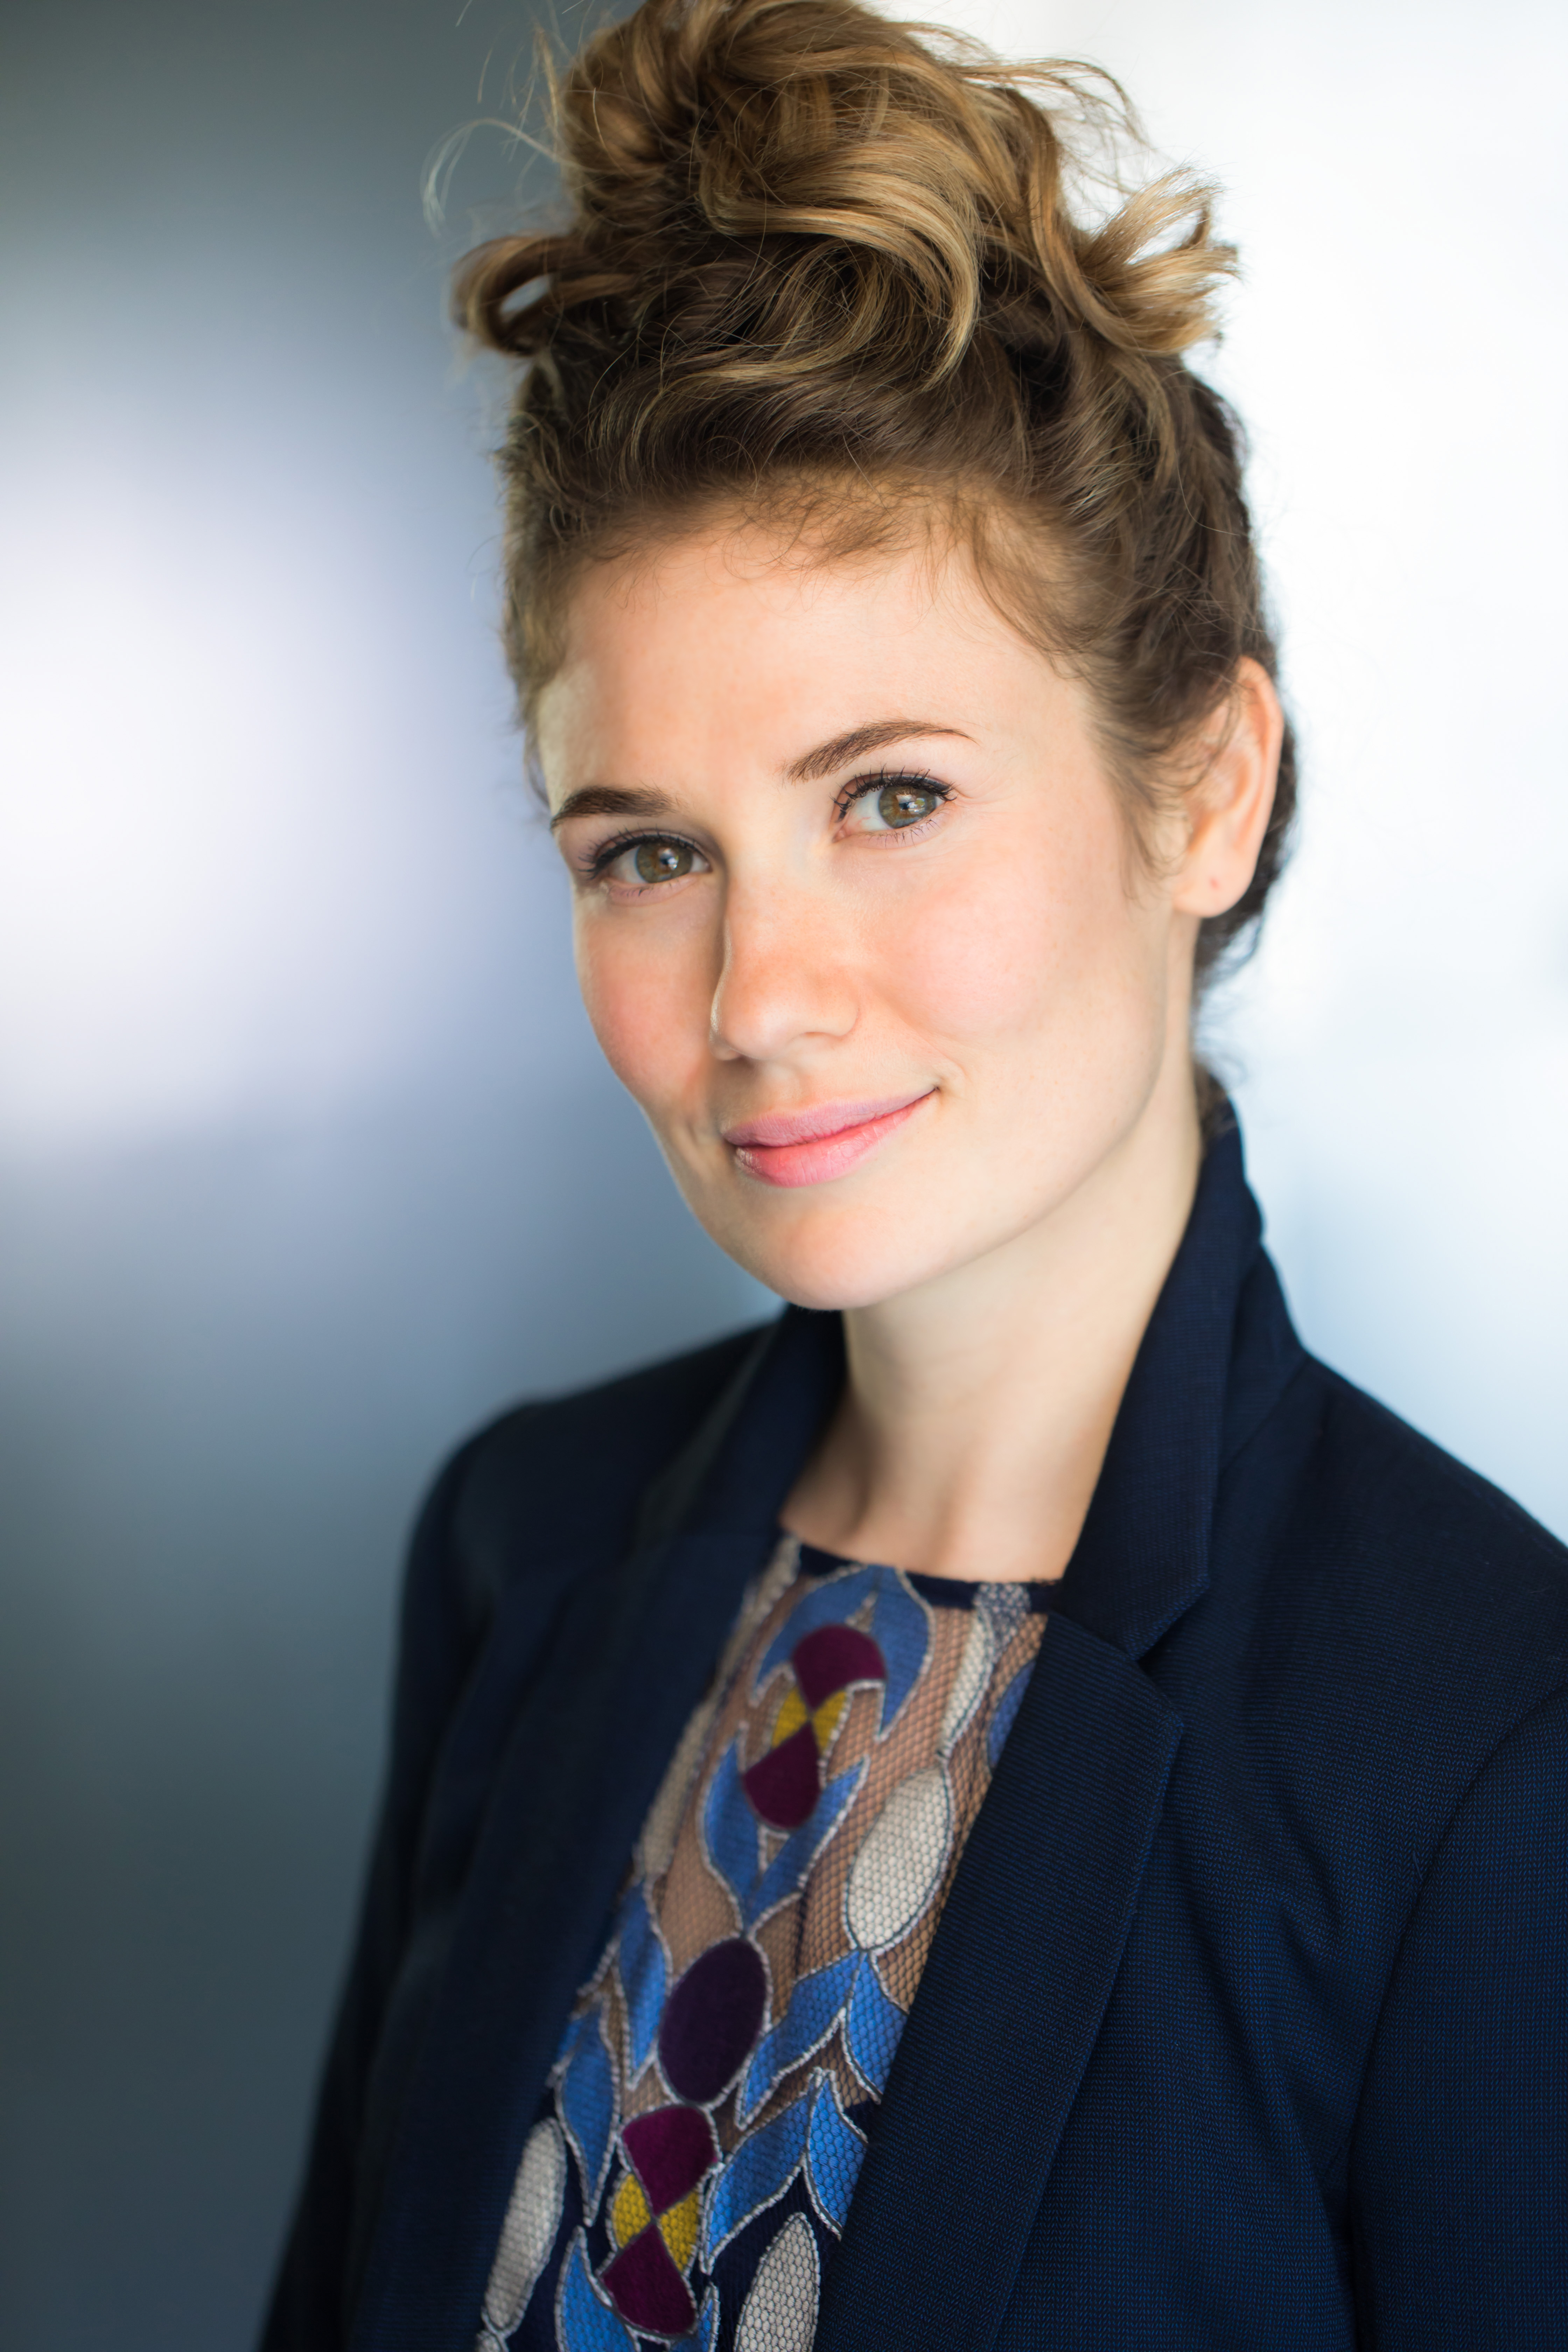 Heather Pasternak